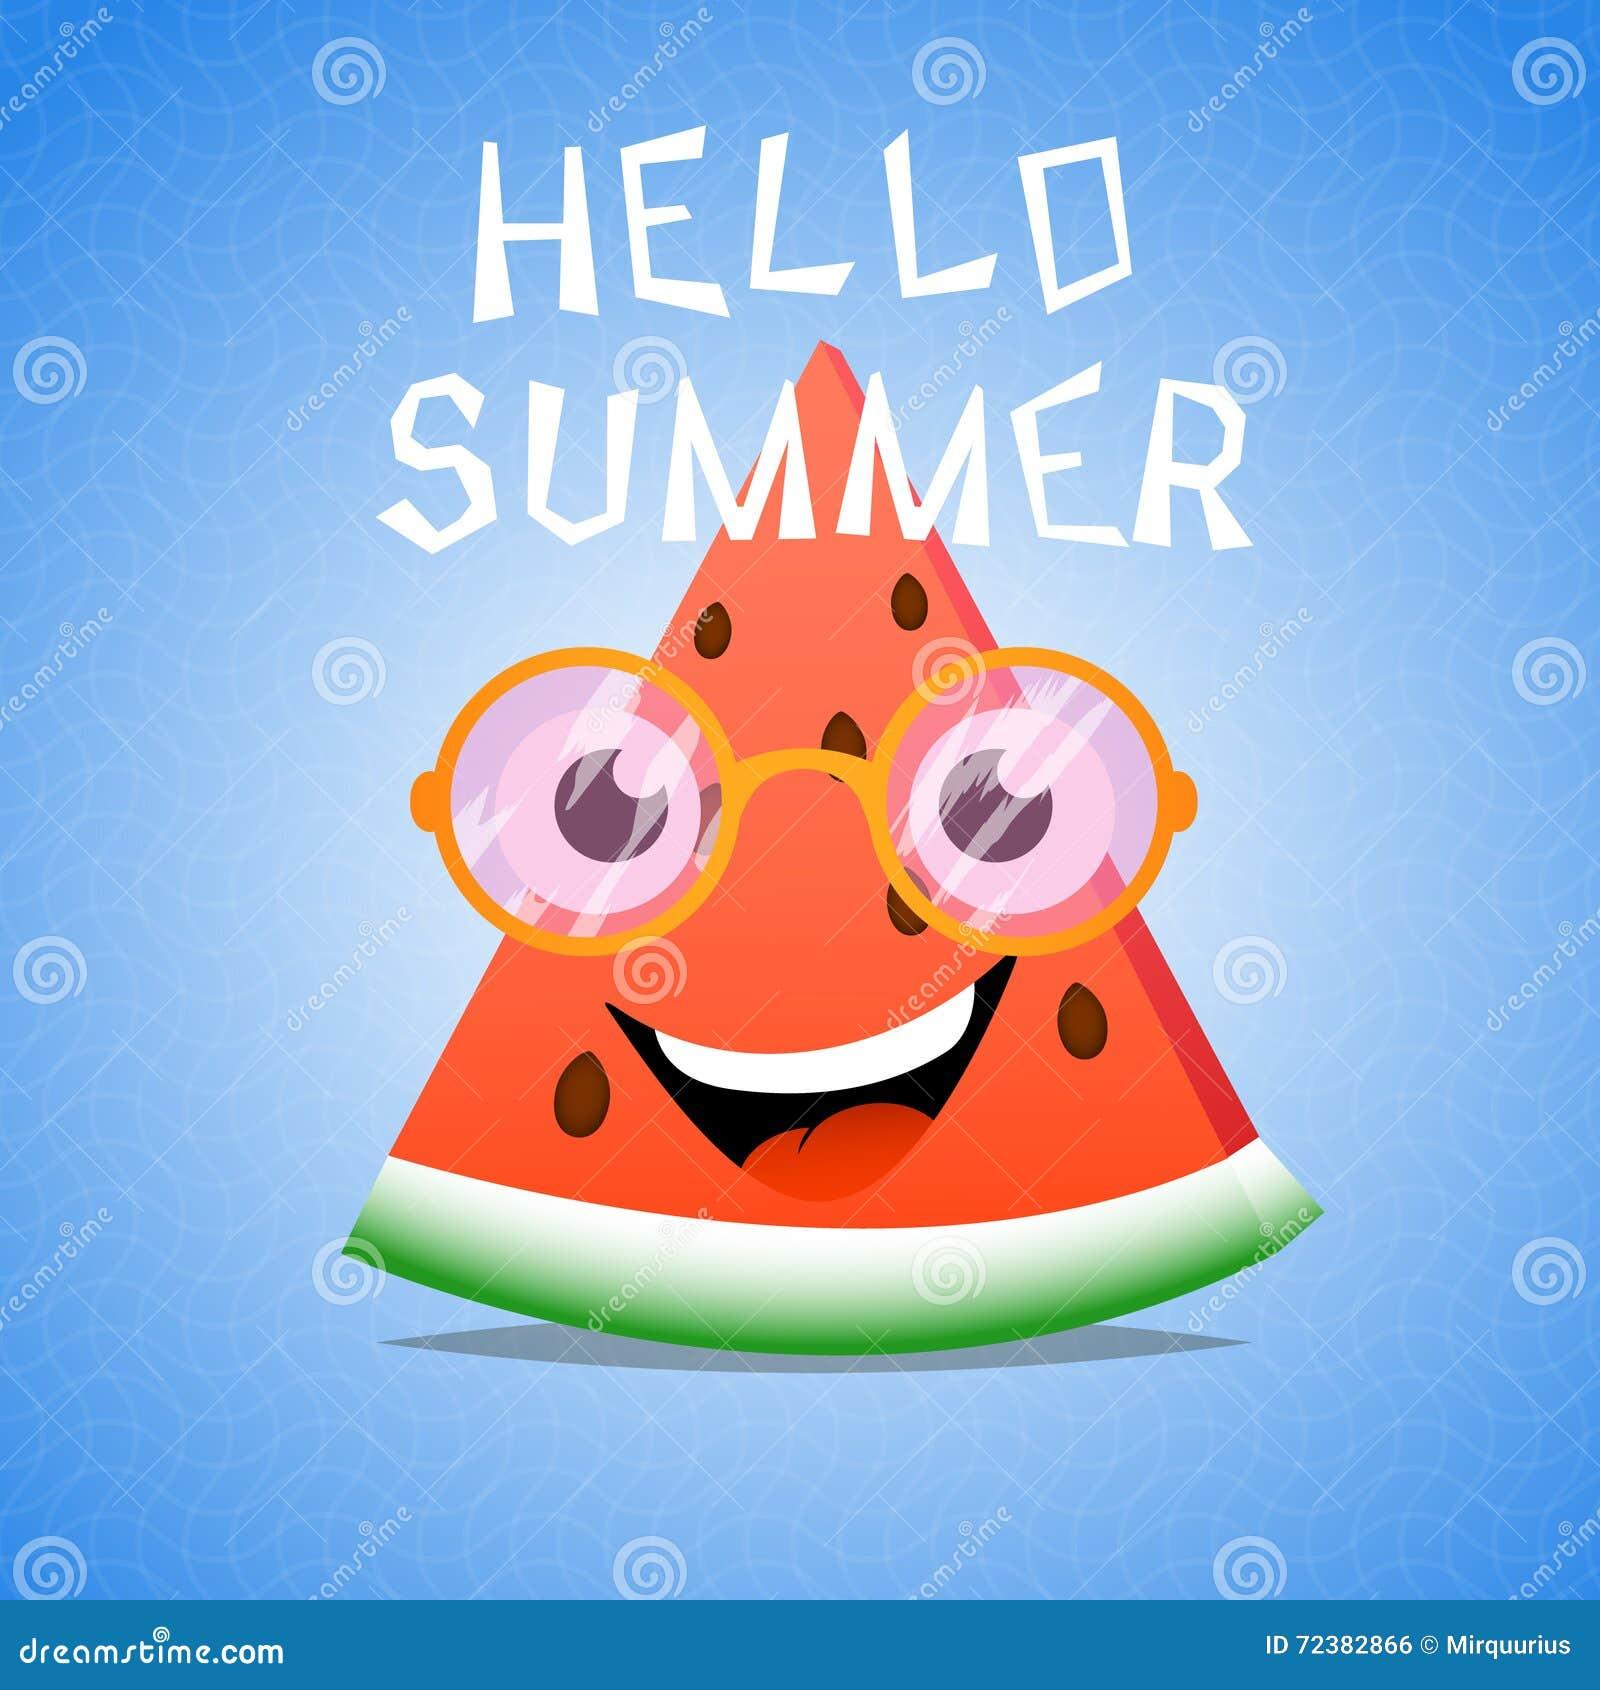 Funny Cartoon Piece Of Watermelon Stock Vector - Image: 72382866